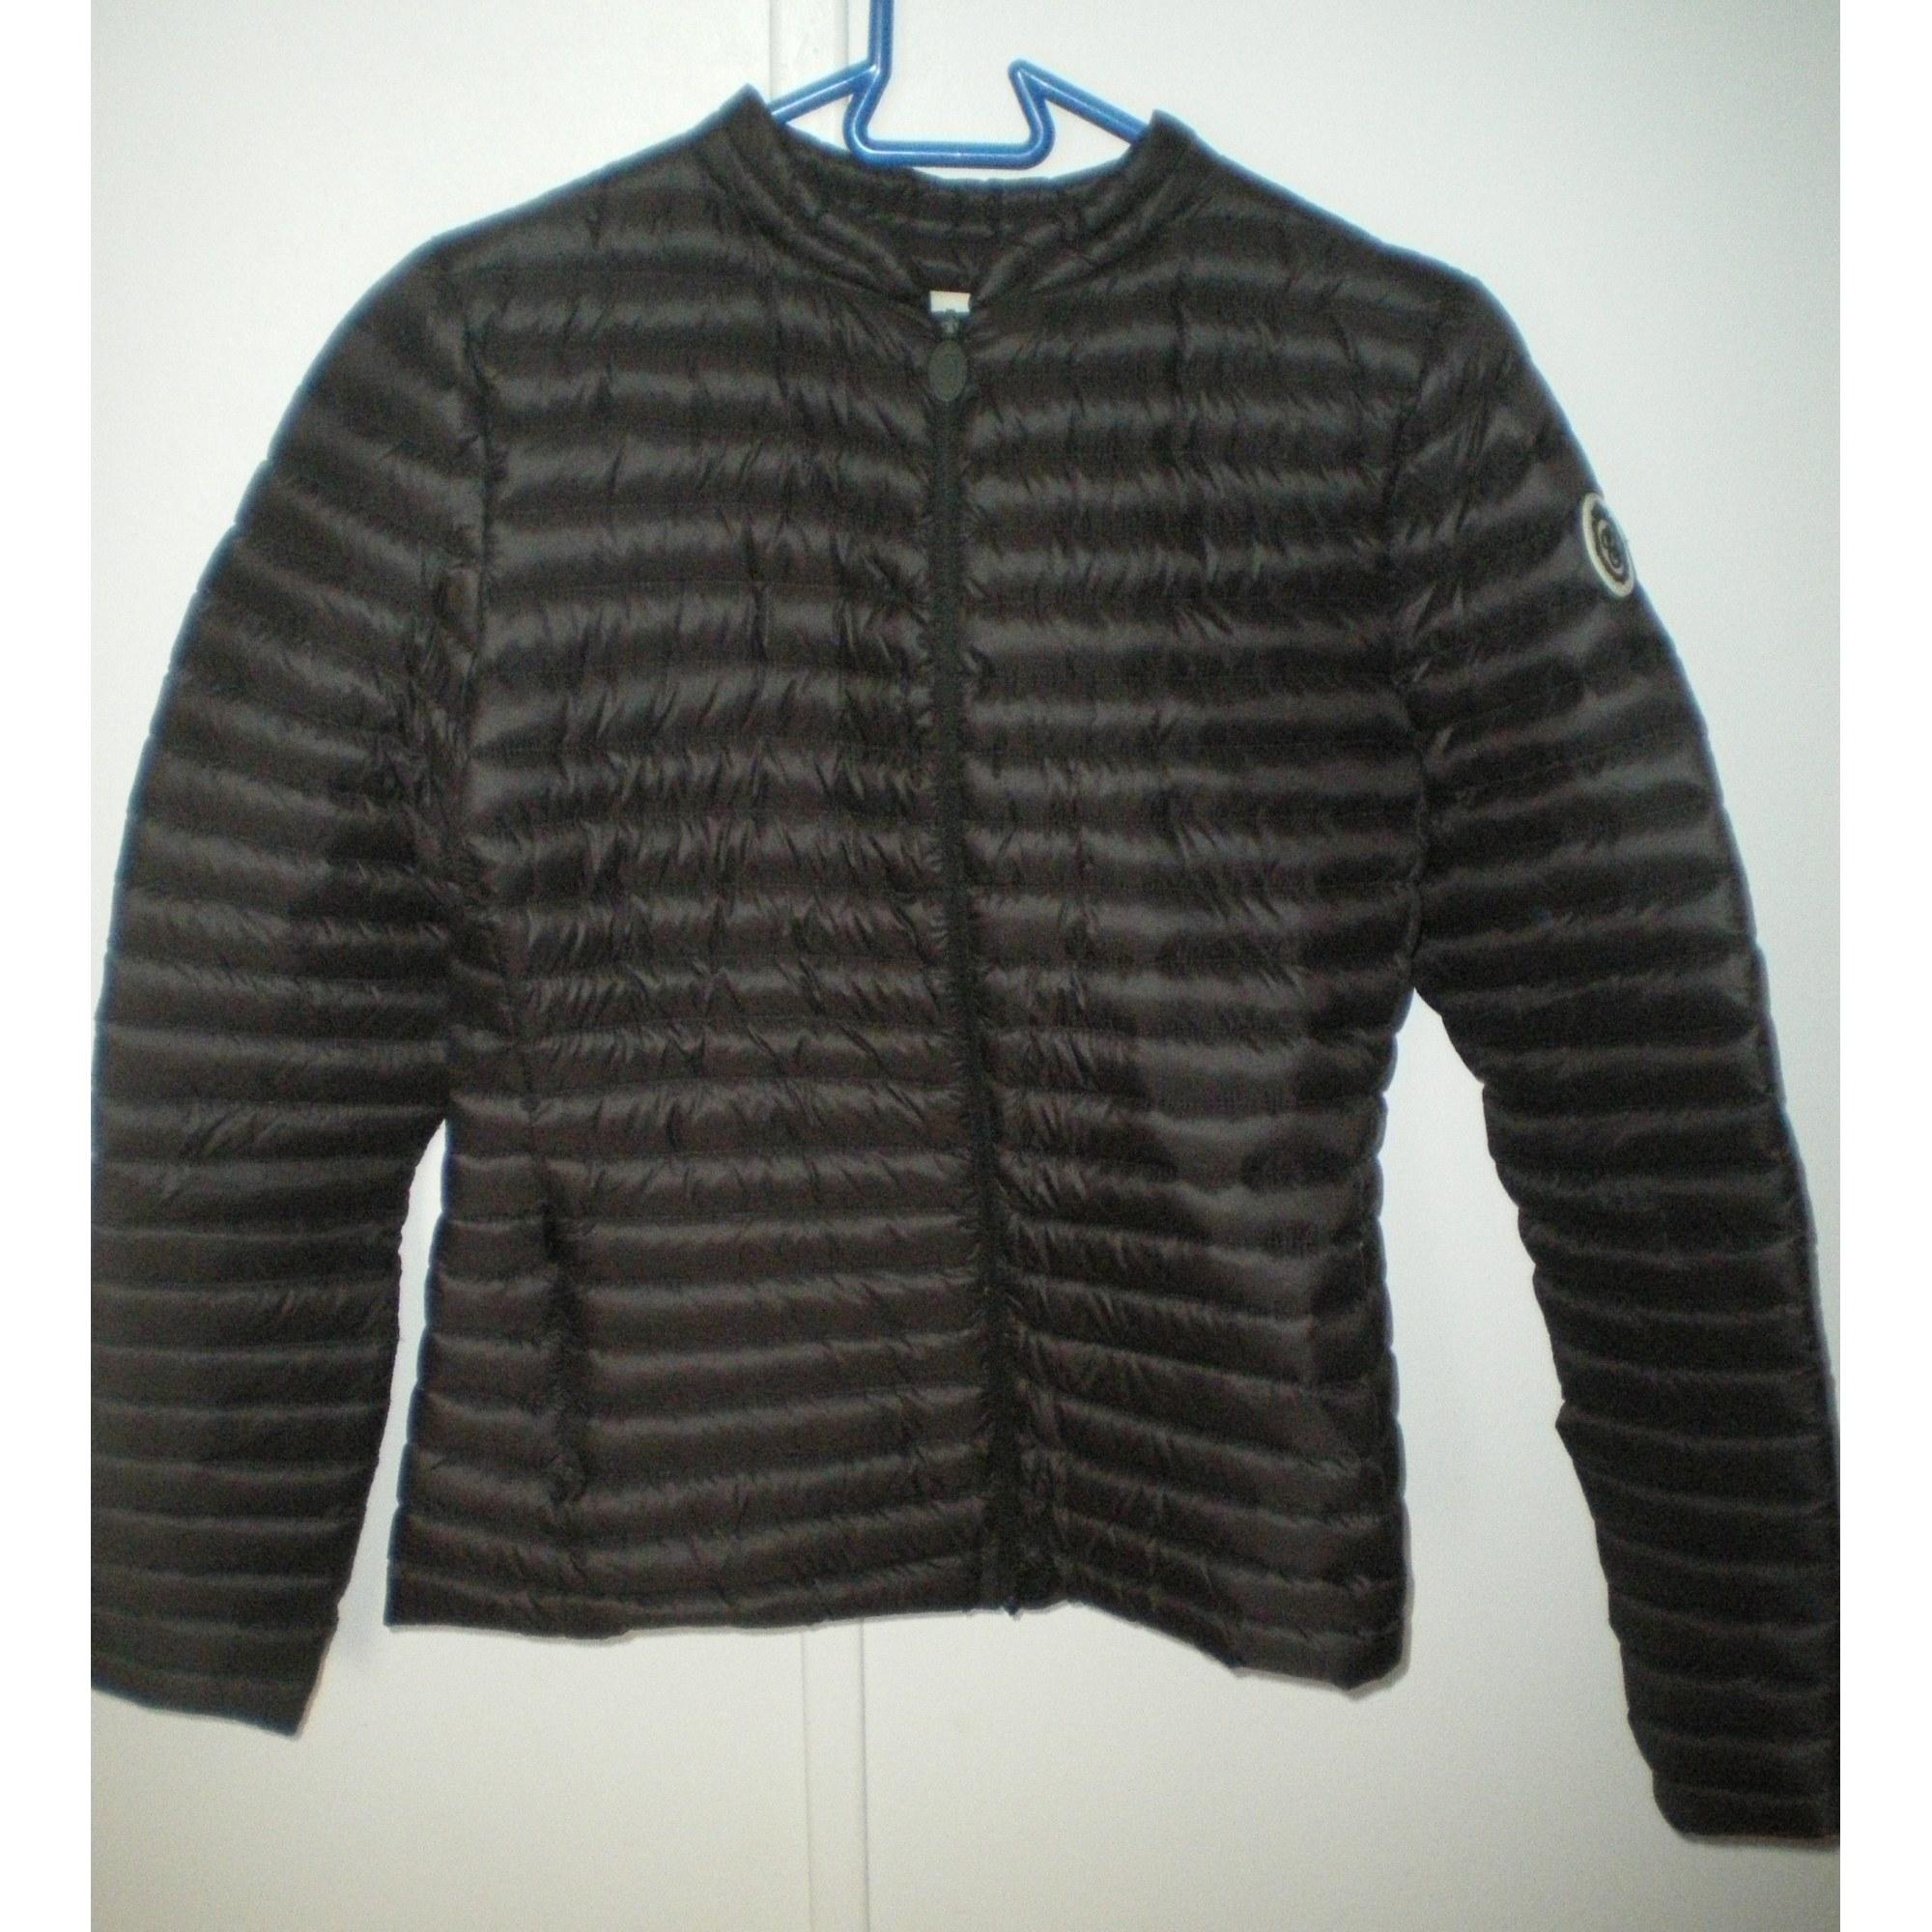 Doudoune GERTRUDE 34 (XS, T0) noir vendu par Sandra 96302957 - 2899588 6df38b9f2a61